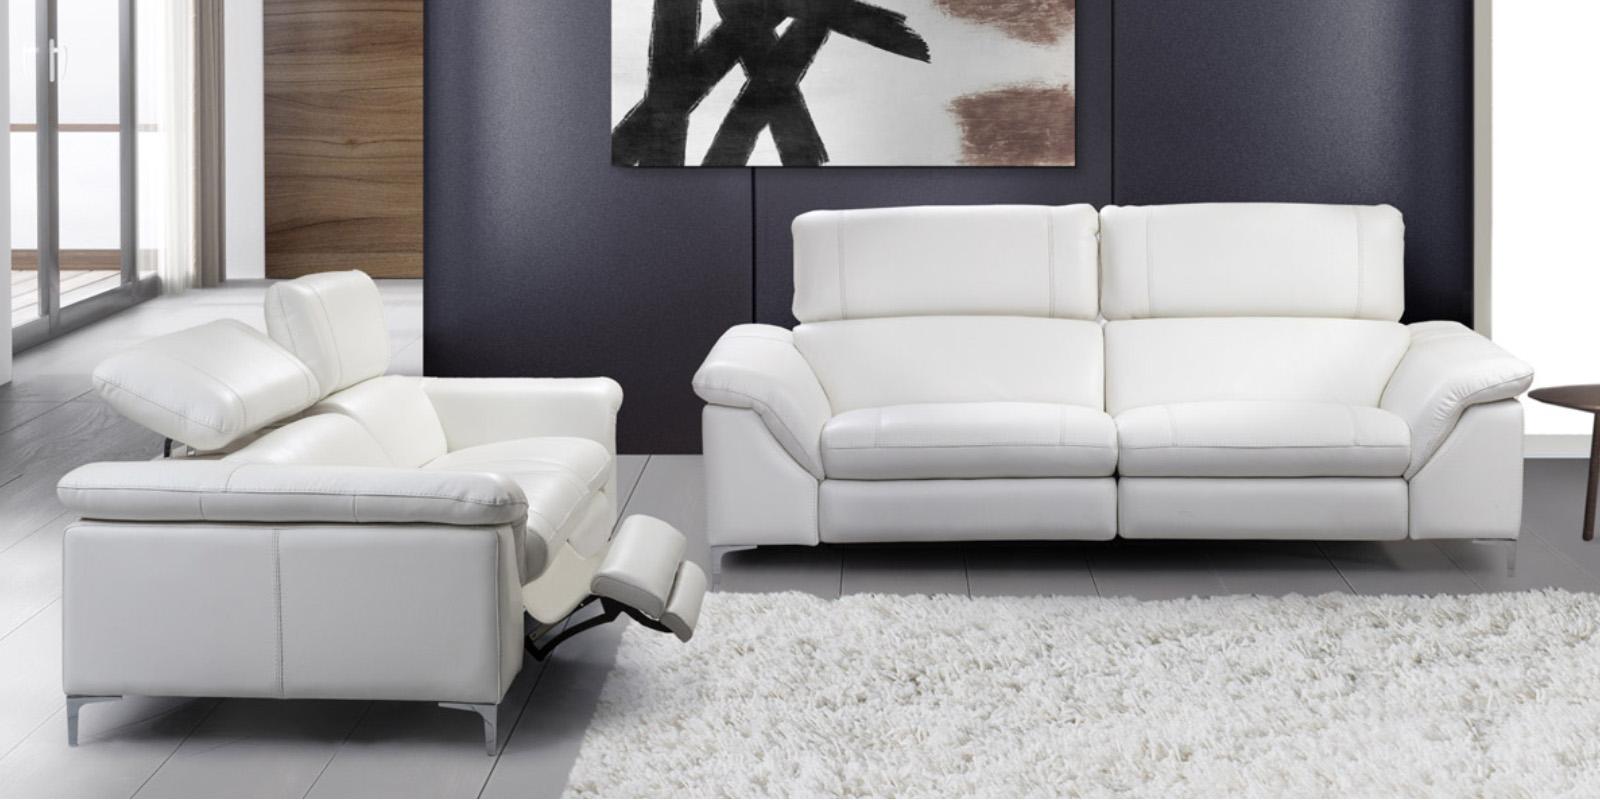 sofa usage a vendre gatineau sparta prague u19 sofascore meubles la detente tendances et ottawa slide 6